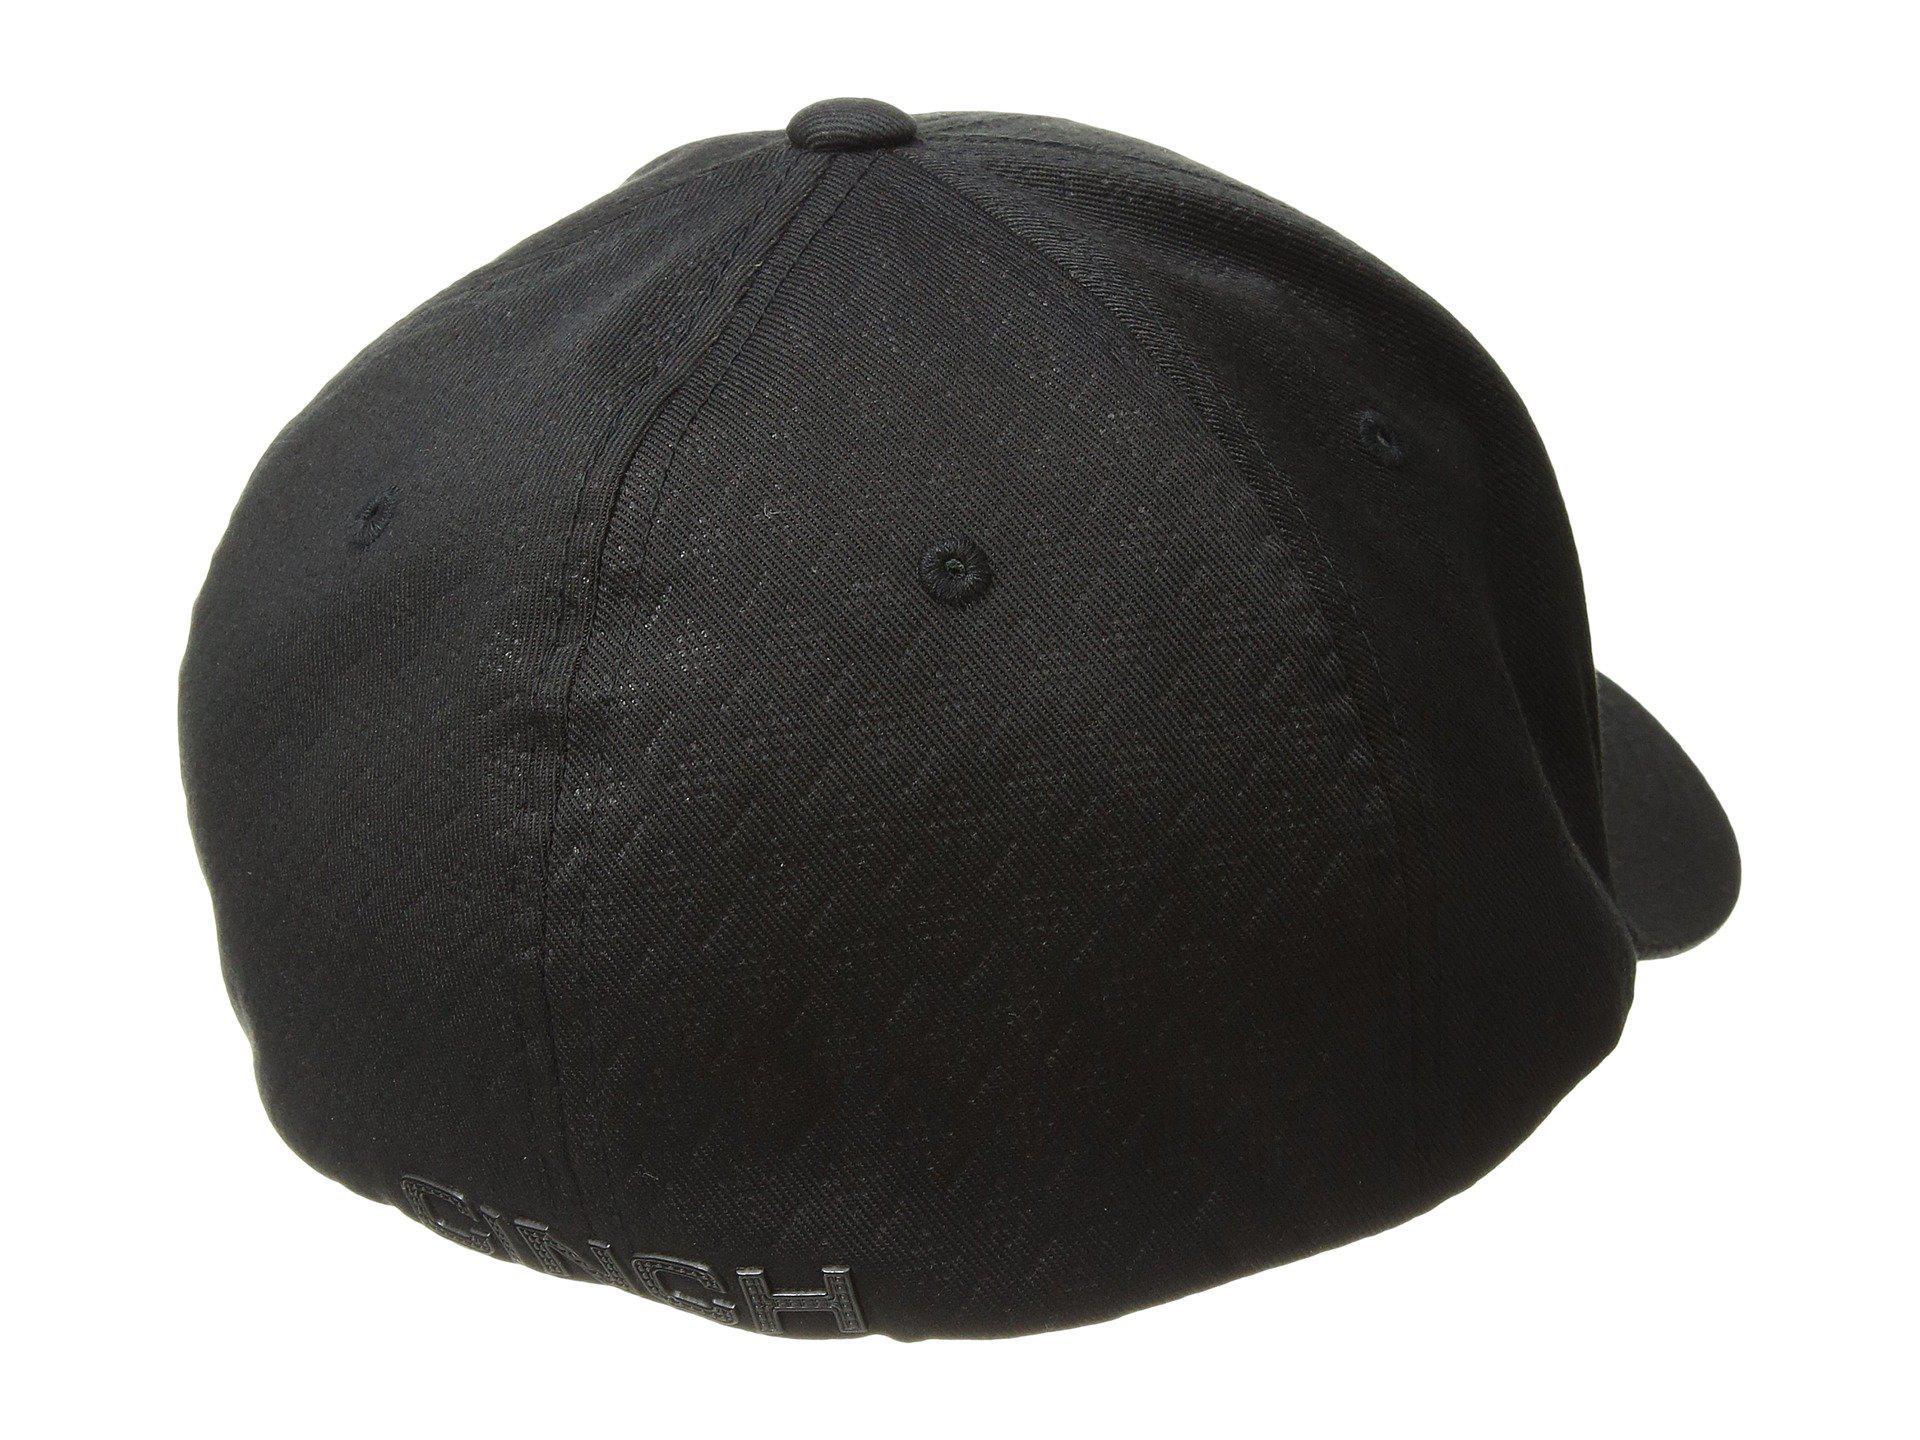 Lyst - Cinch Mid-profile Flexfit 3d Hat in Black for Men 0c49c22f036b